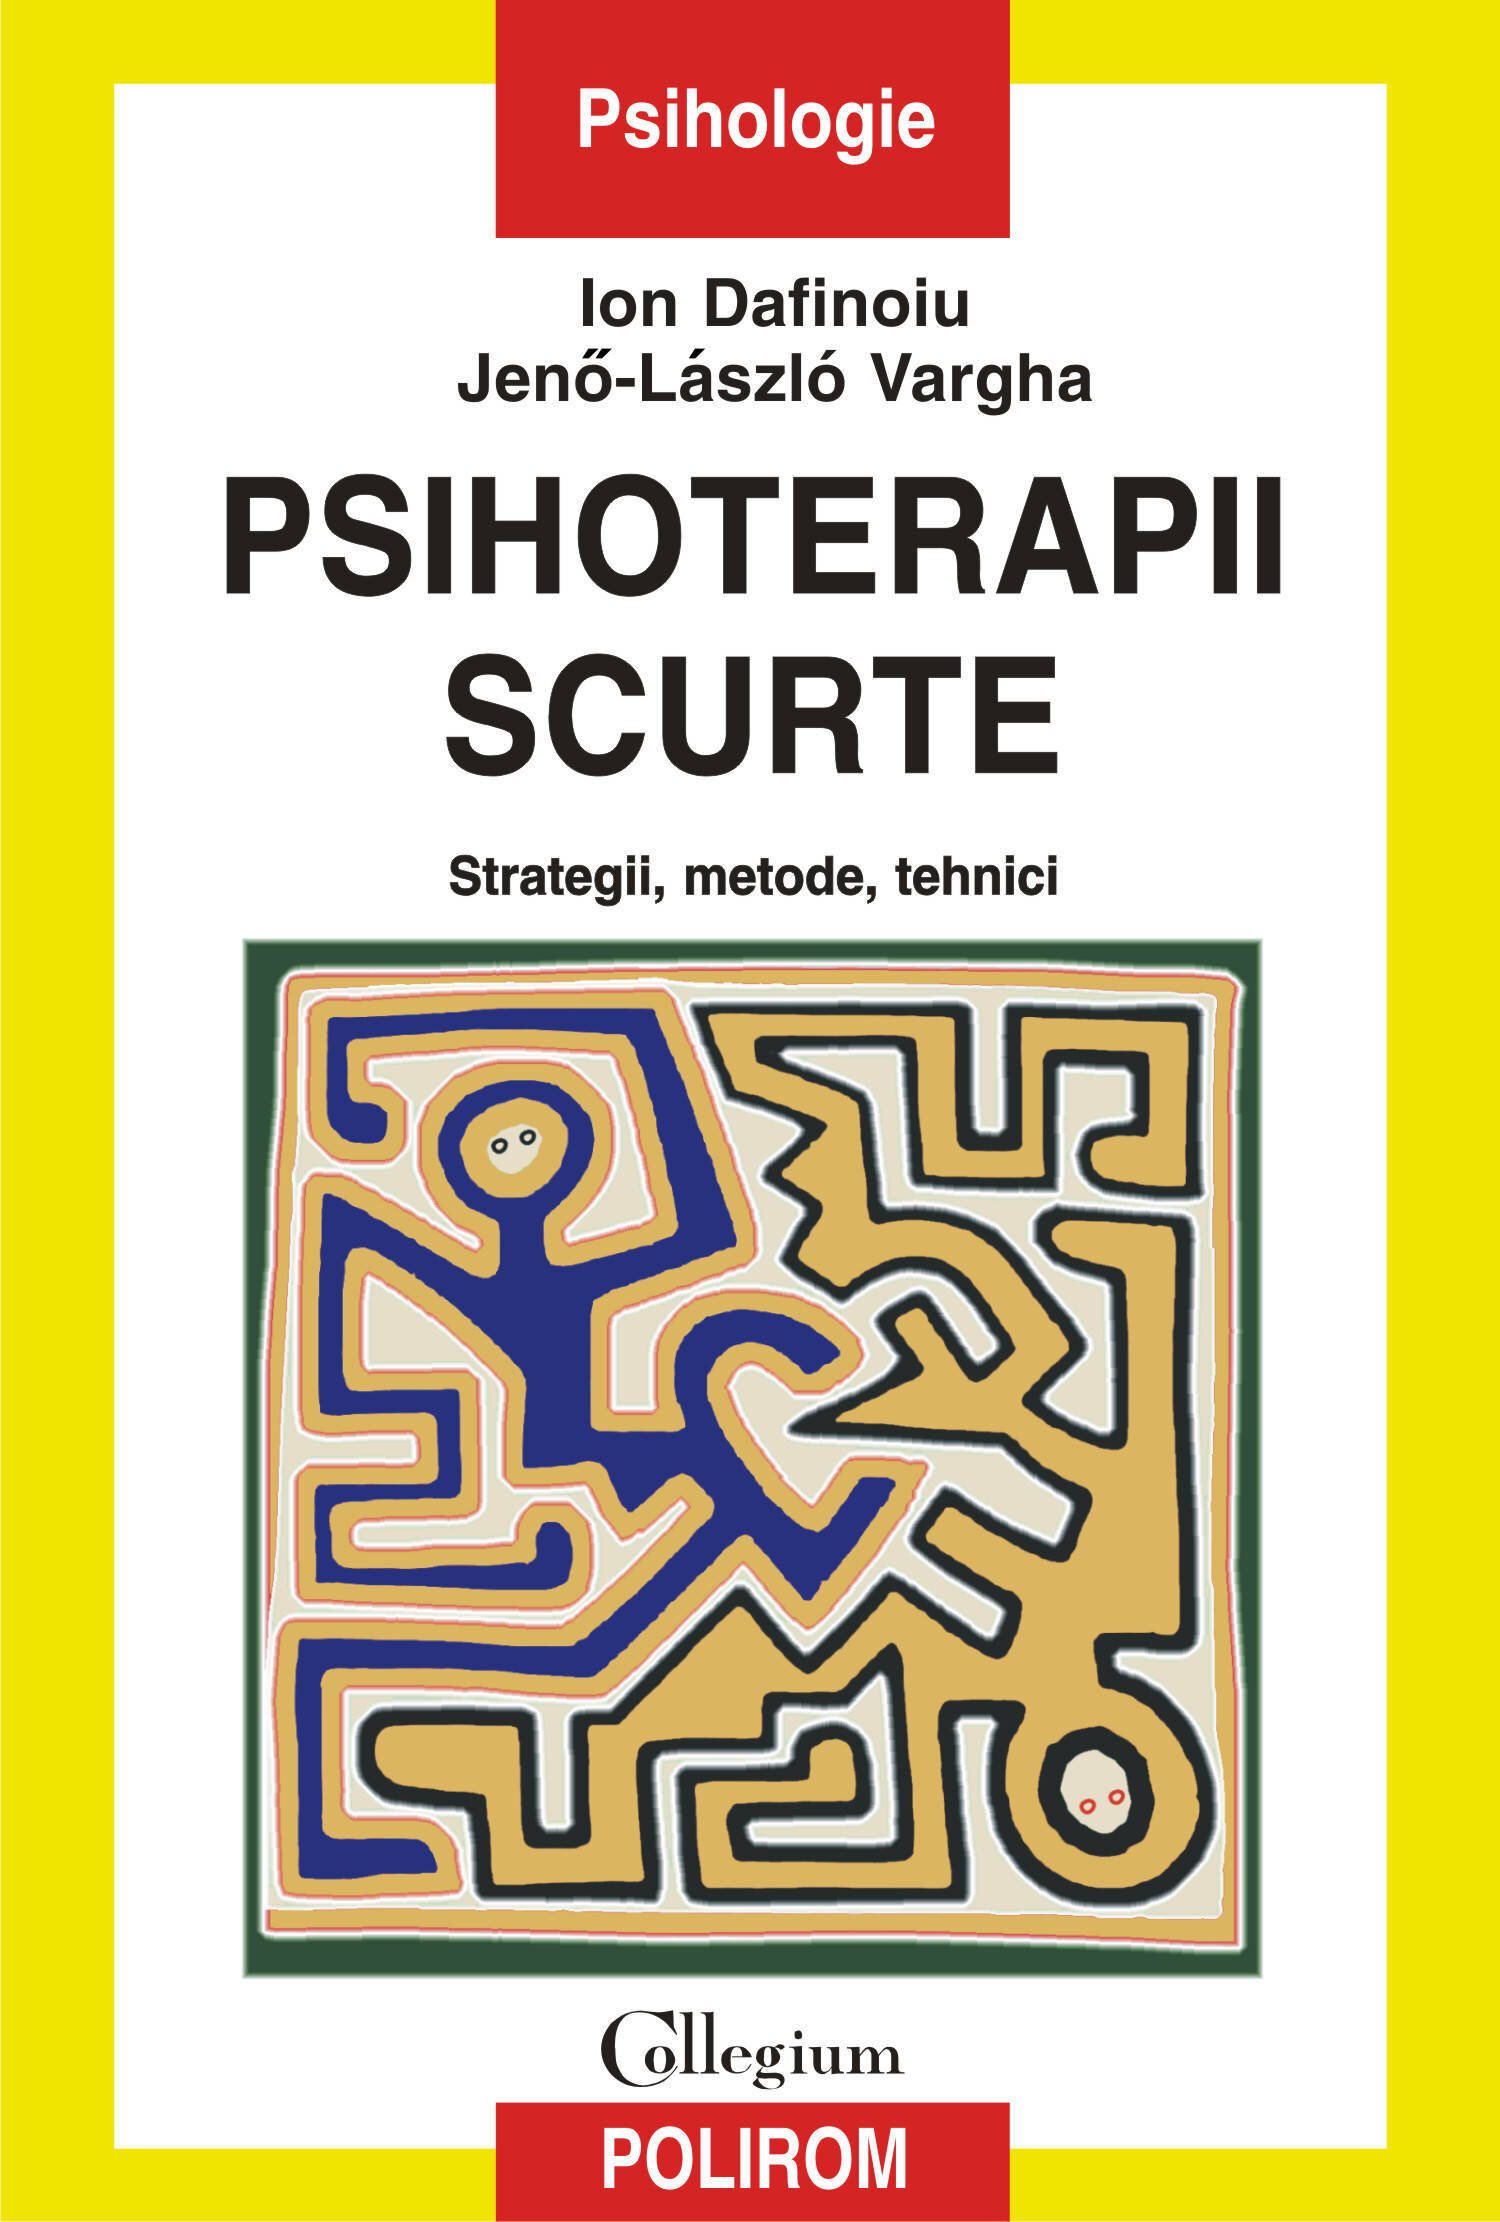 Psihoterapii scurte (eBook)